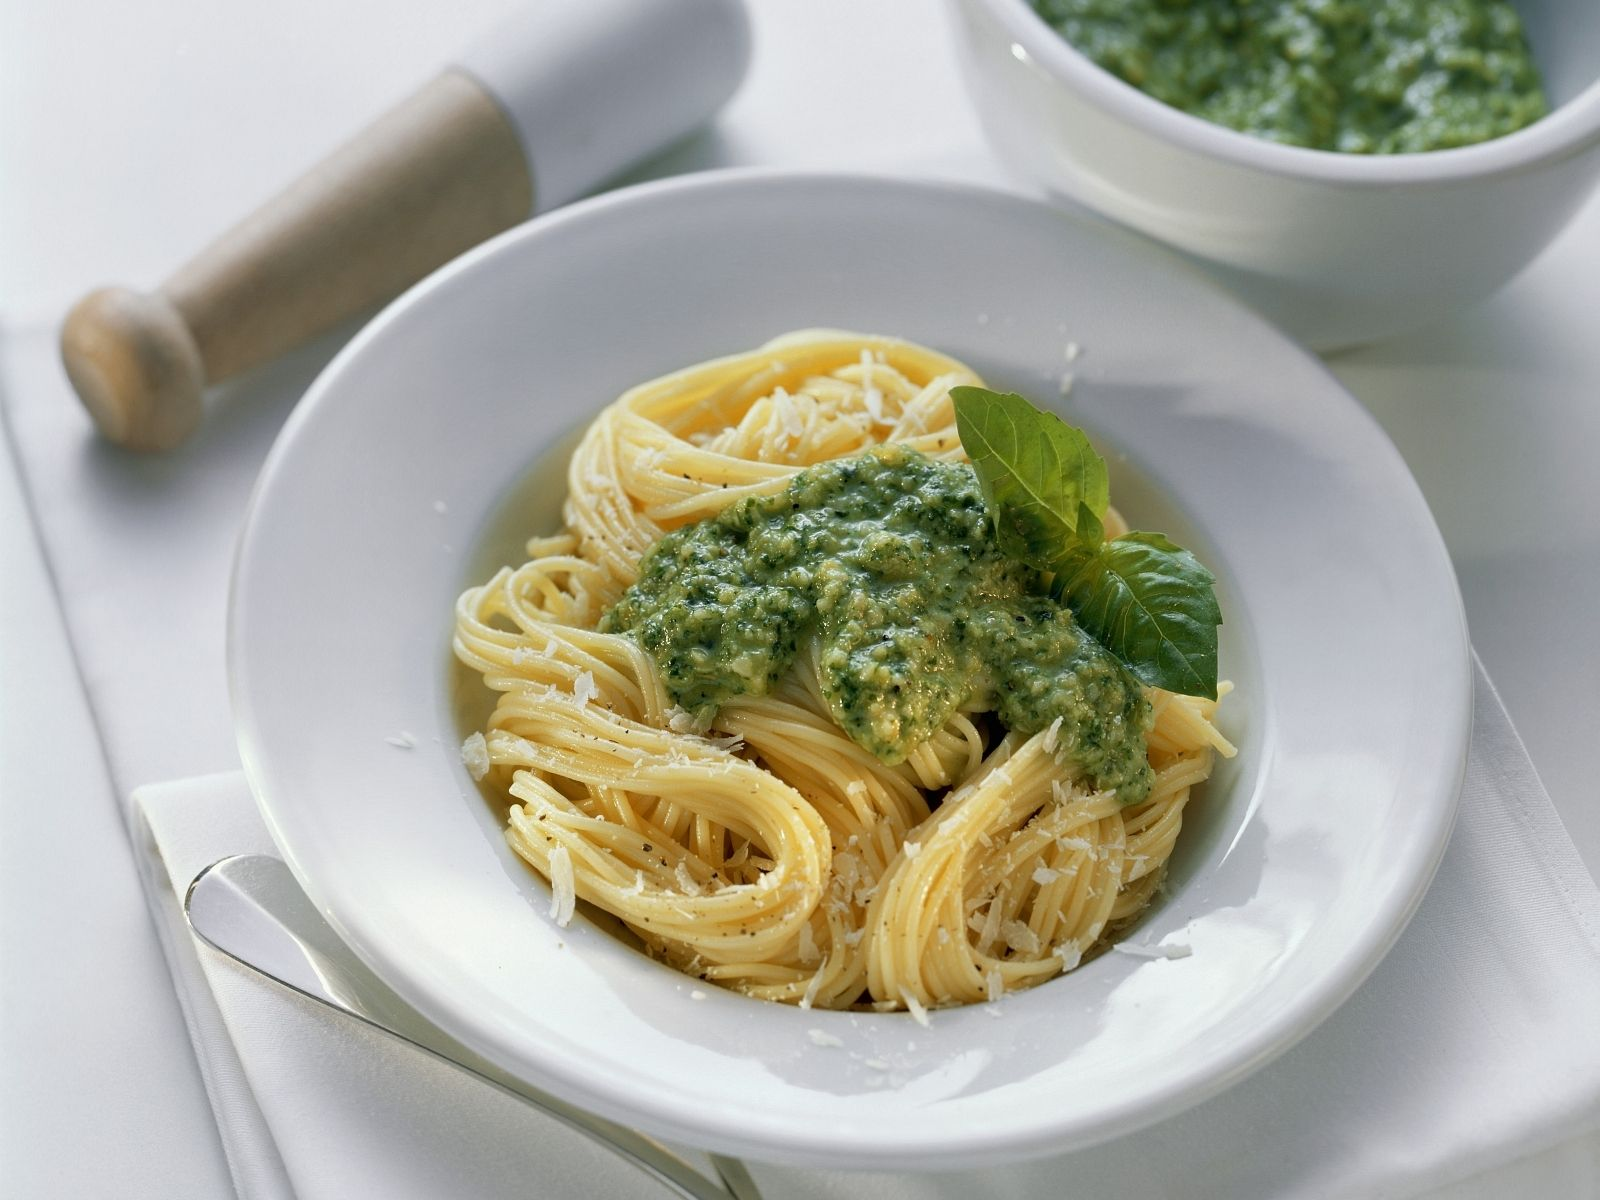 Spaghetti with Pesto Verde